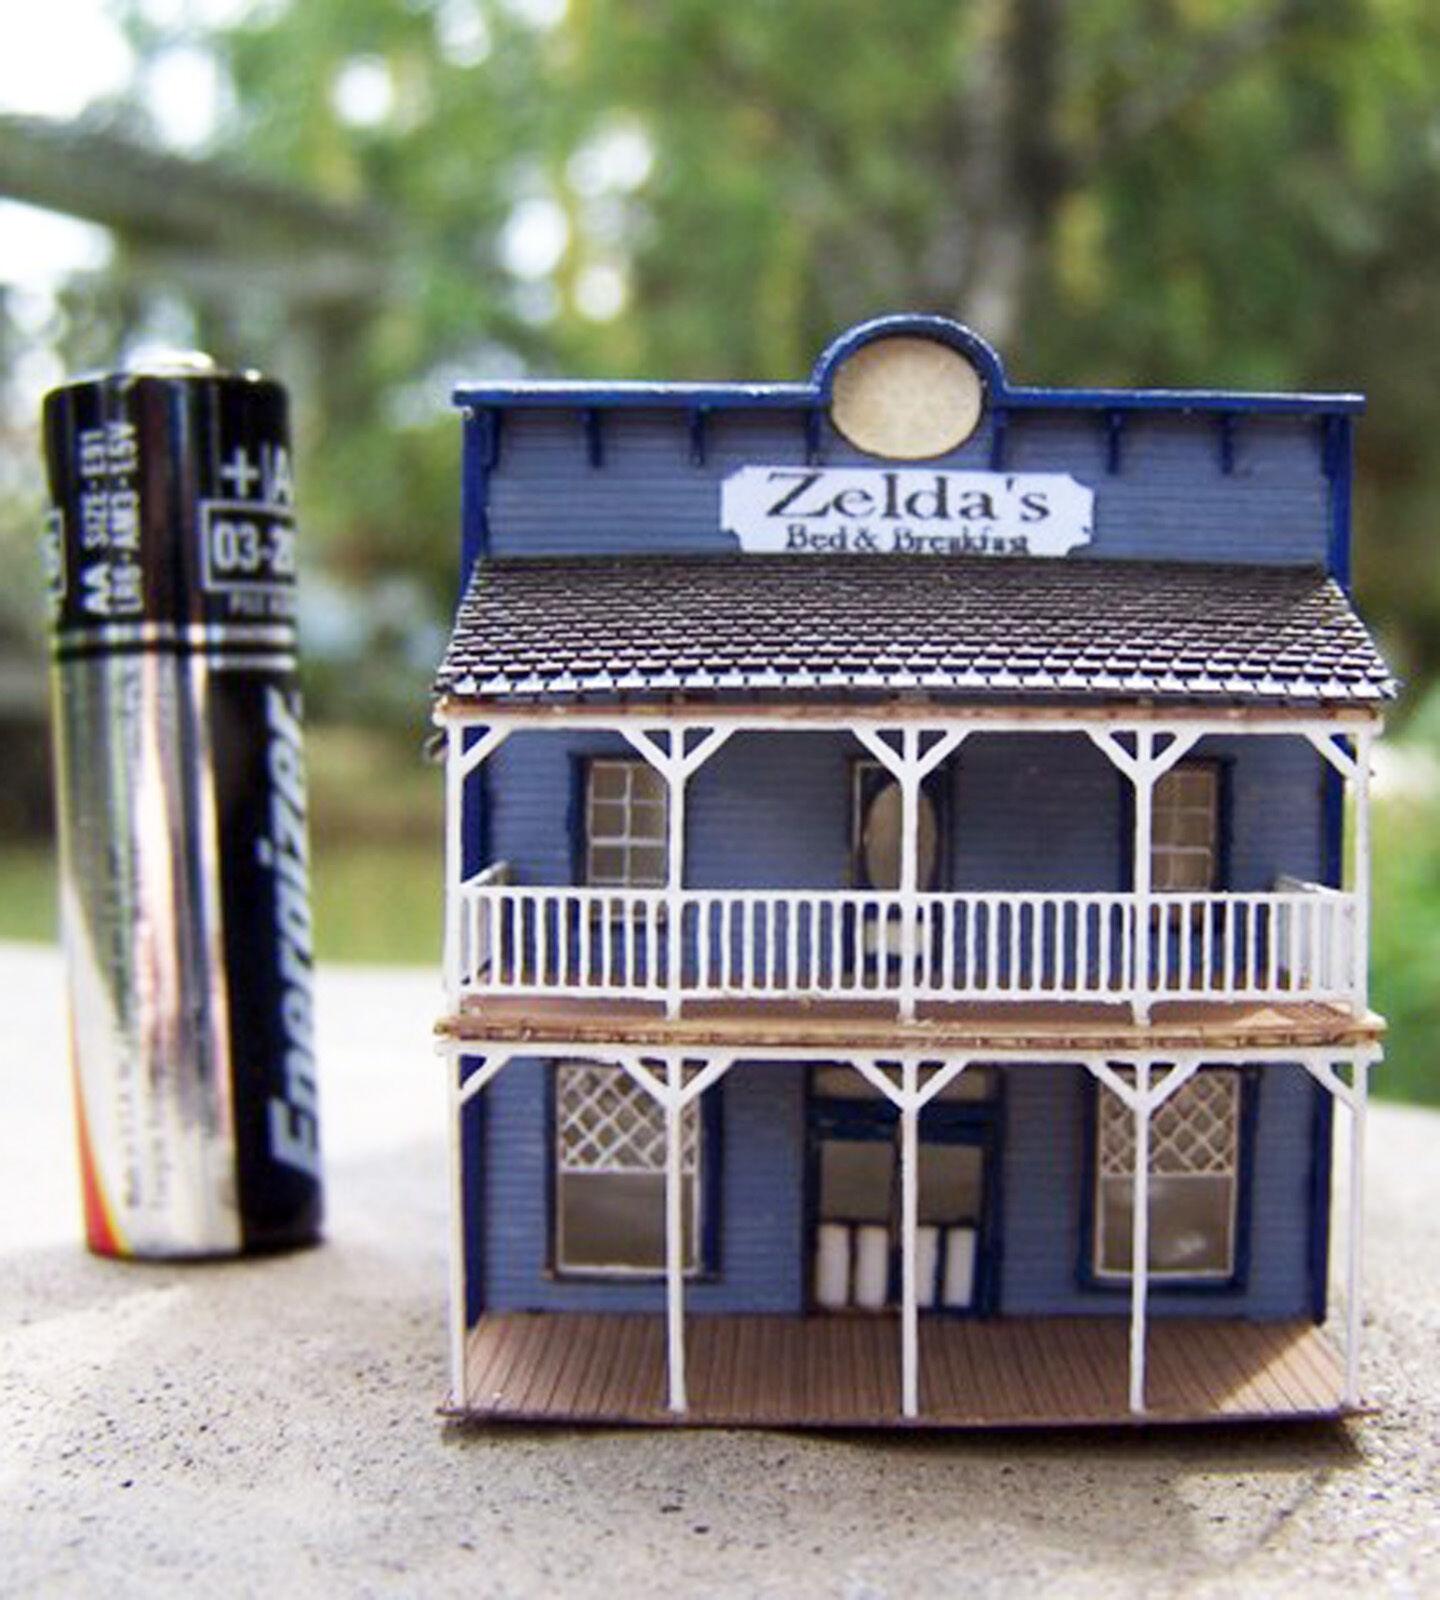 GEM HOTEL Z Scale Model Railroad Structure Unpainted Wood Laser Kit RSL4022